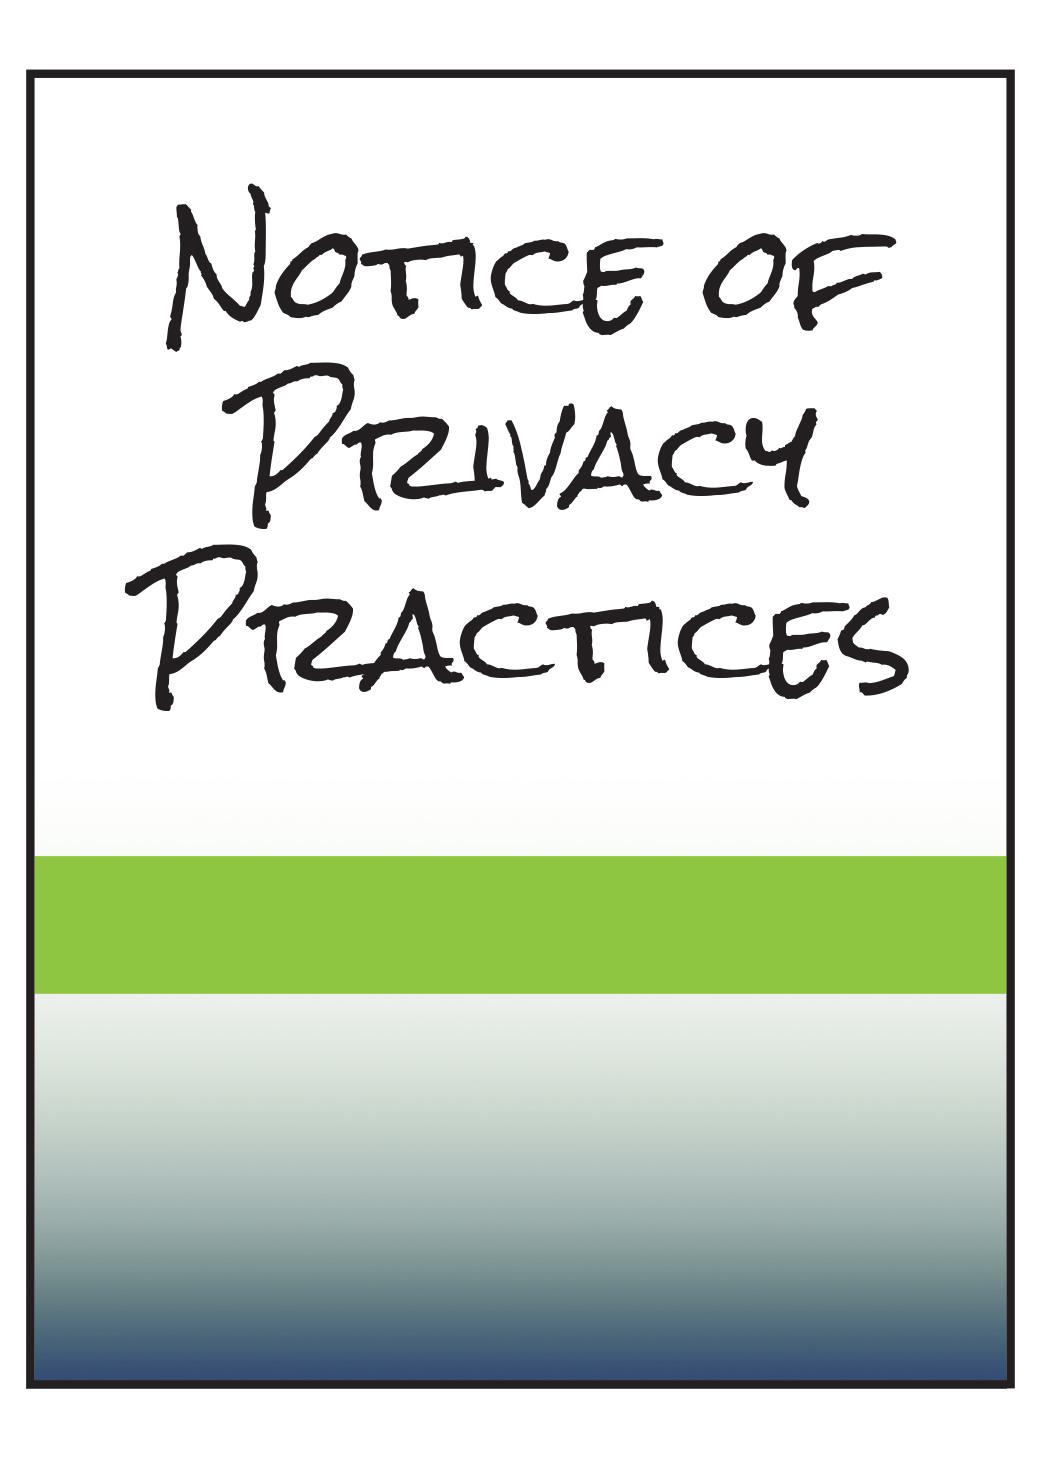 cochrane-privacy-practices.jpg